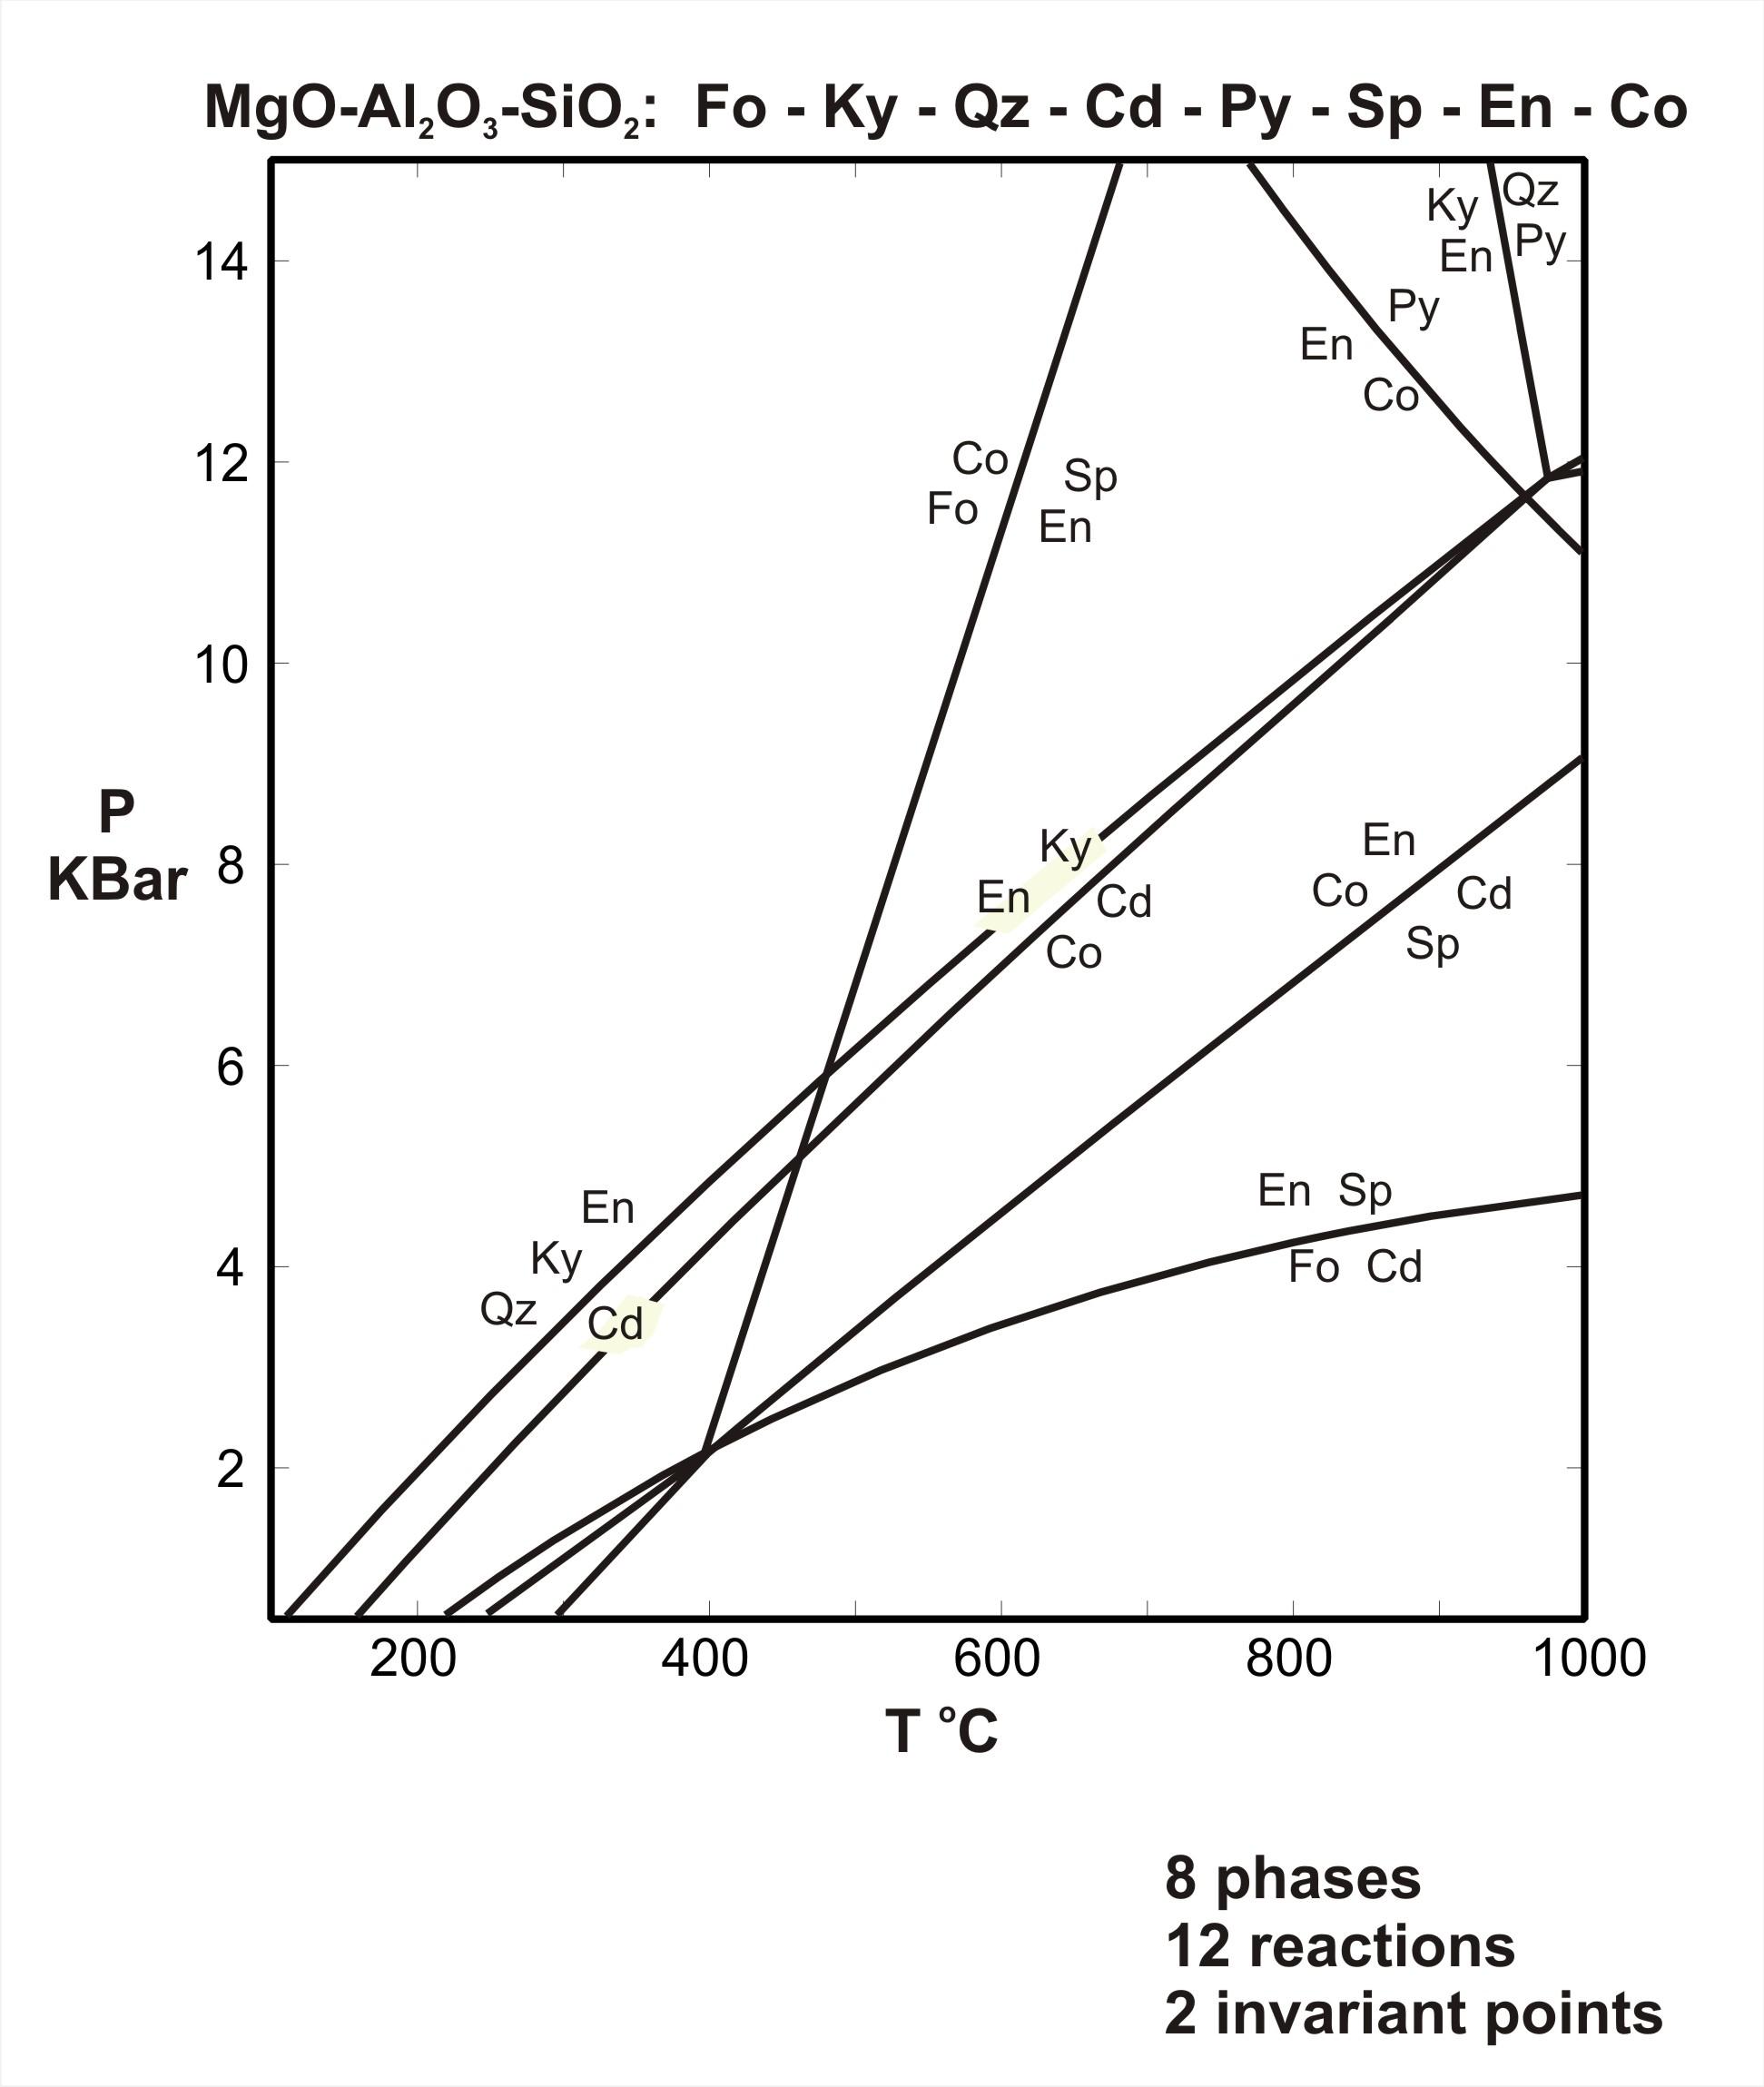 hight resolution of pt diagram for the system mgo al2o3 sio2 download pdf acrobat pdf 19kb jun6 07